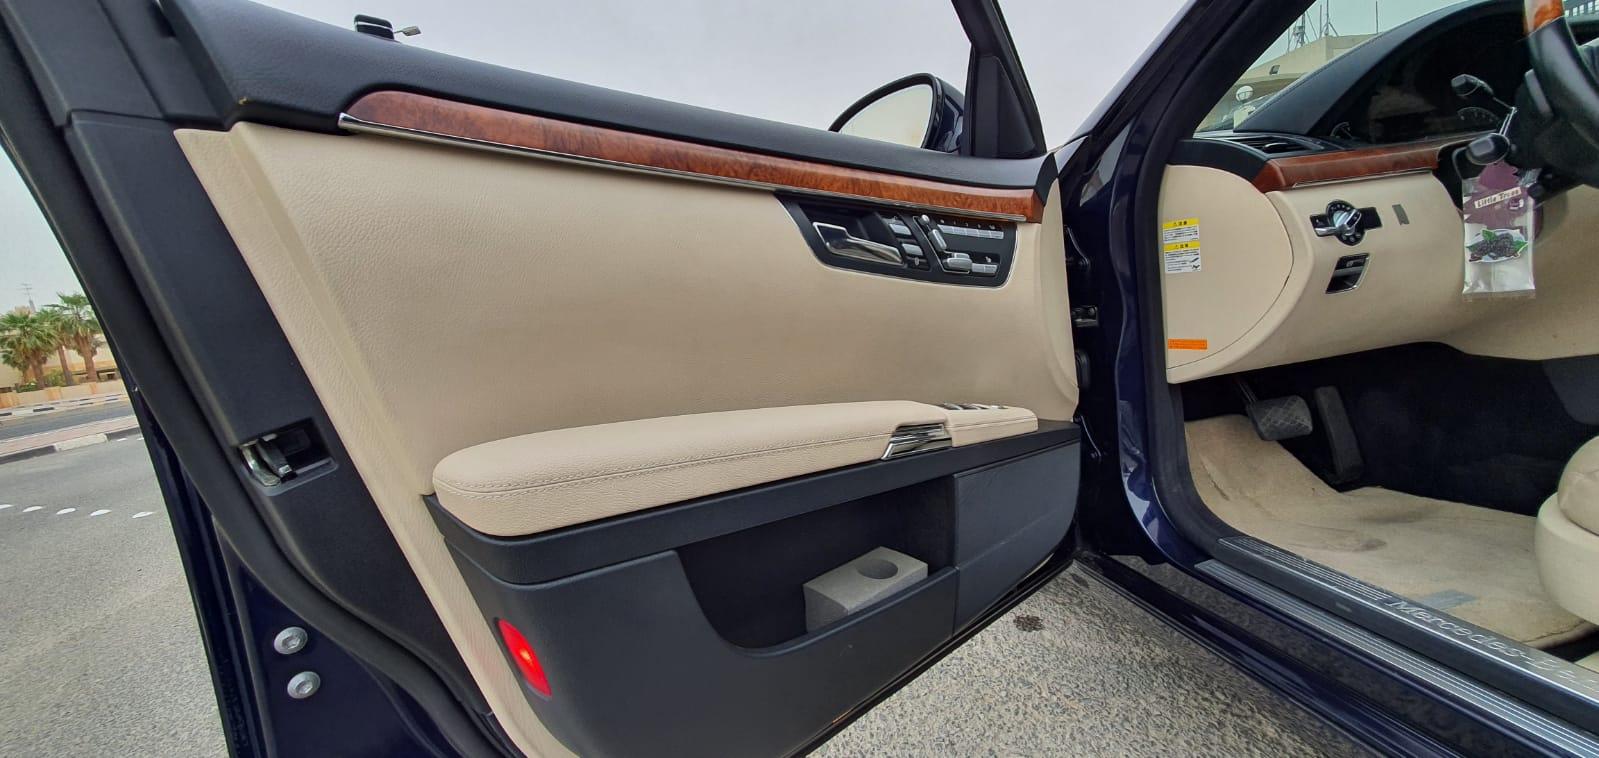 Mercedes-Benz S350 2009